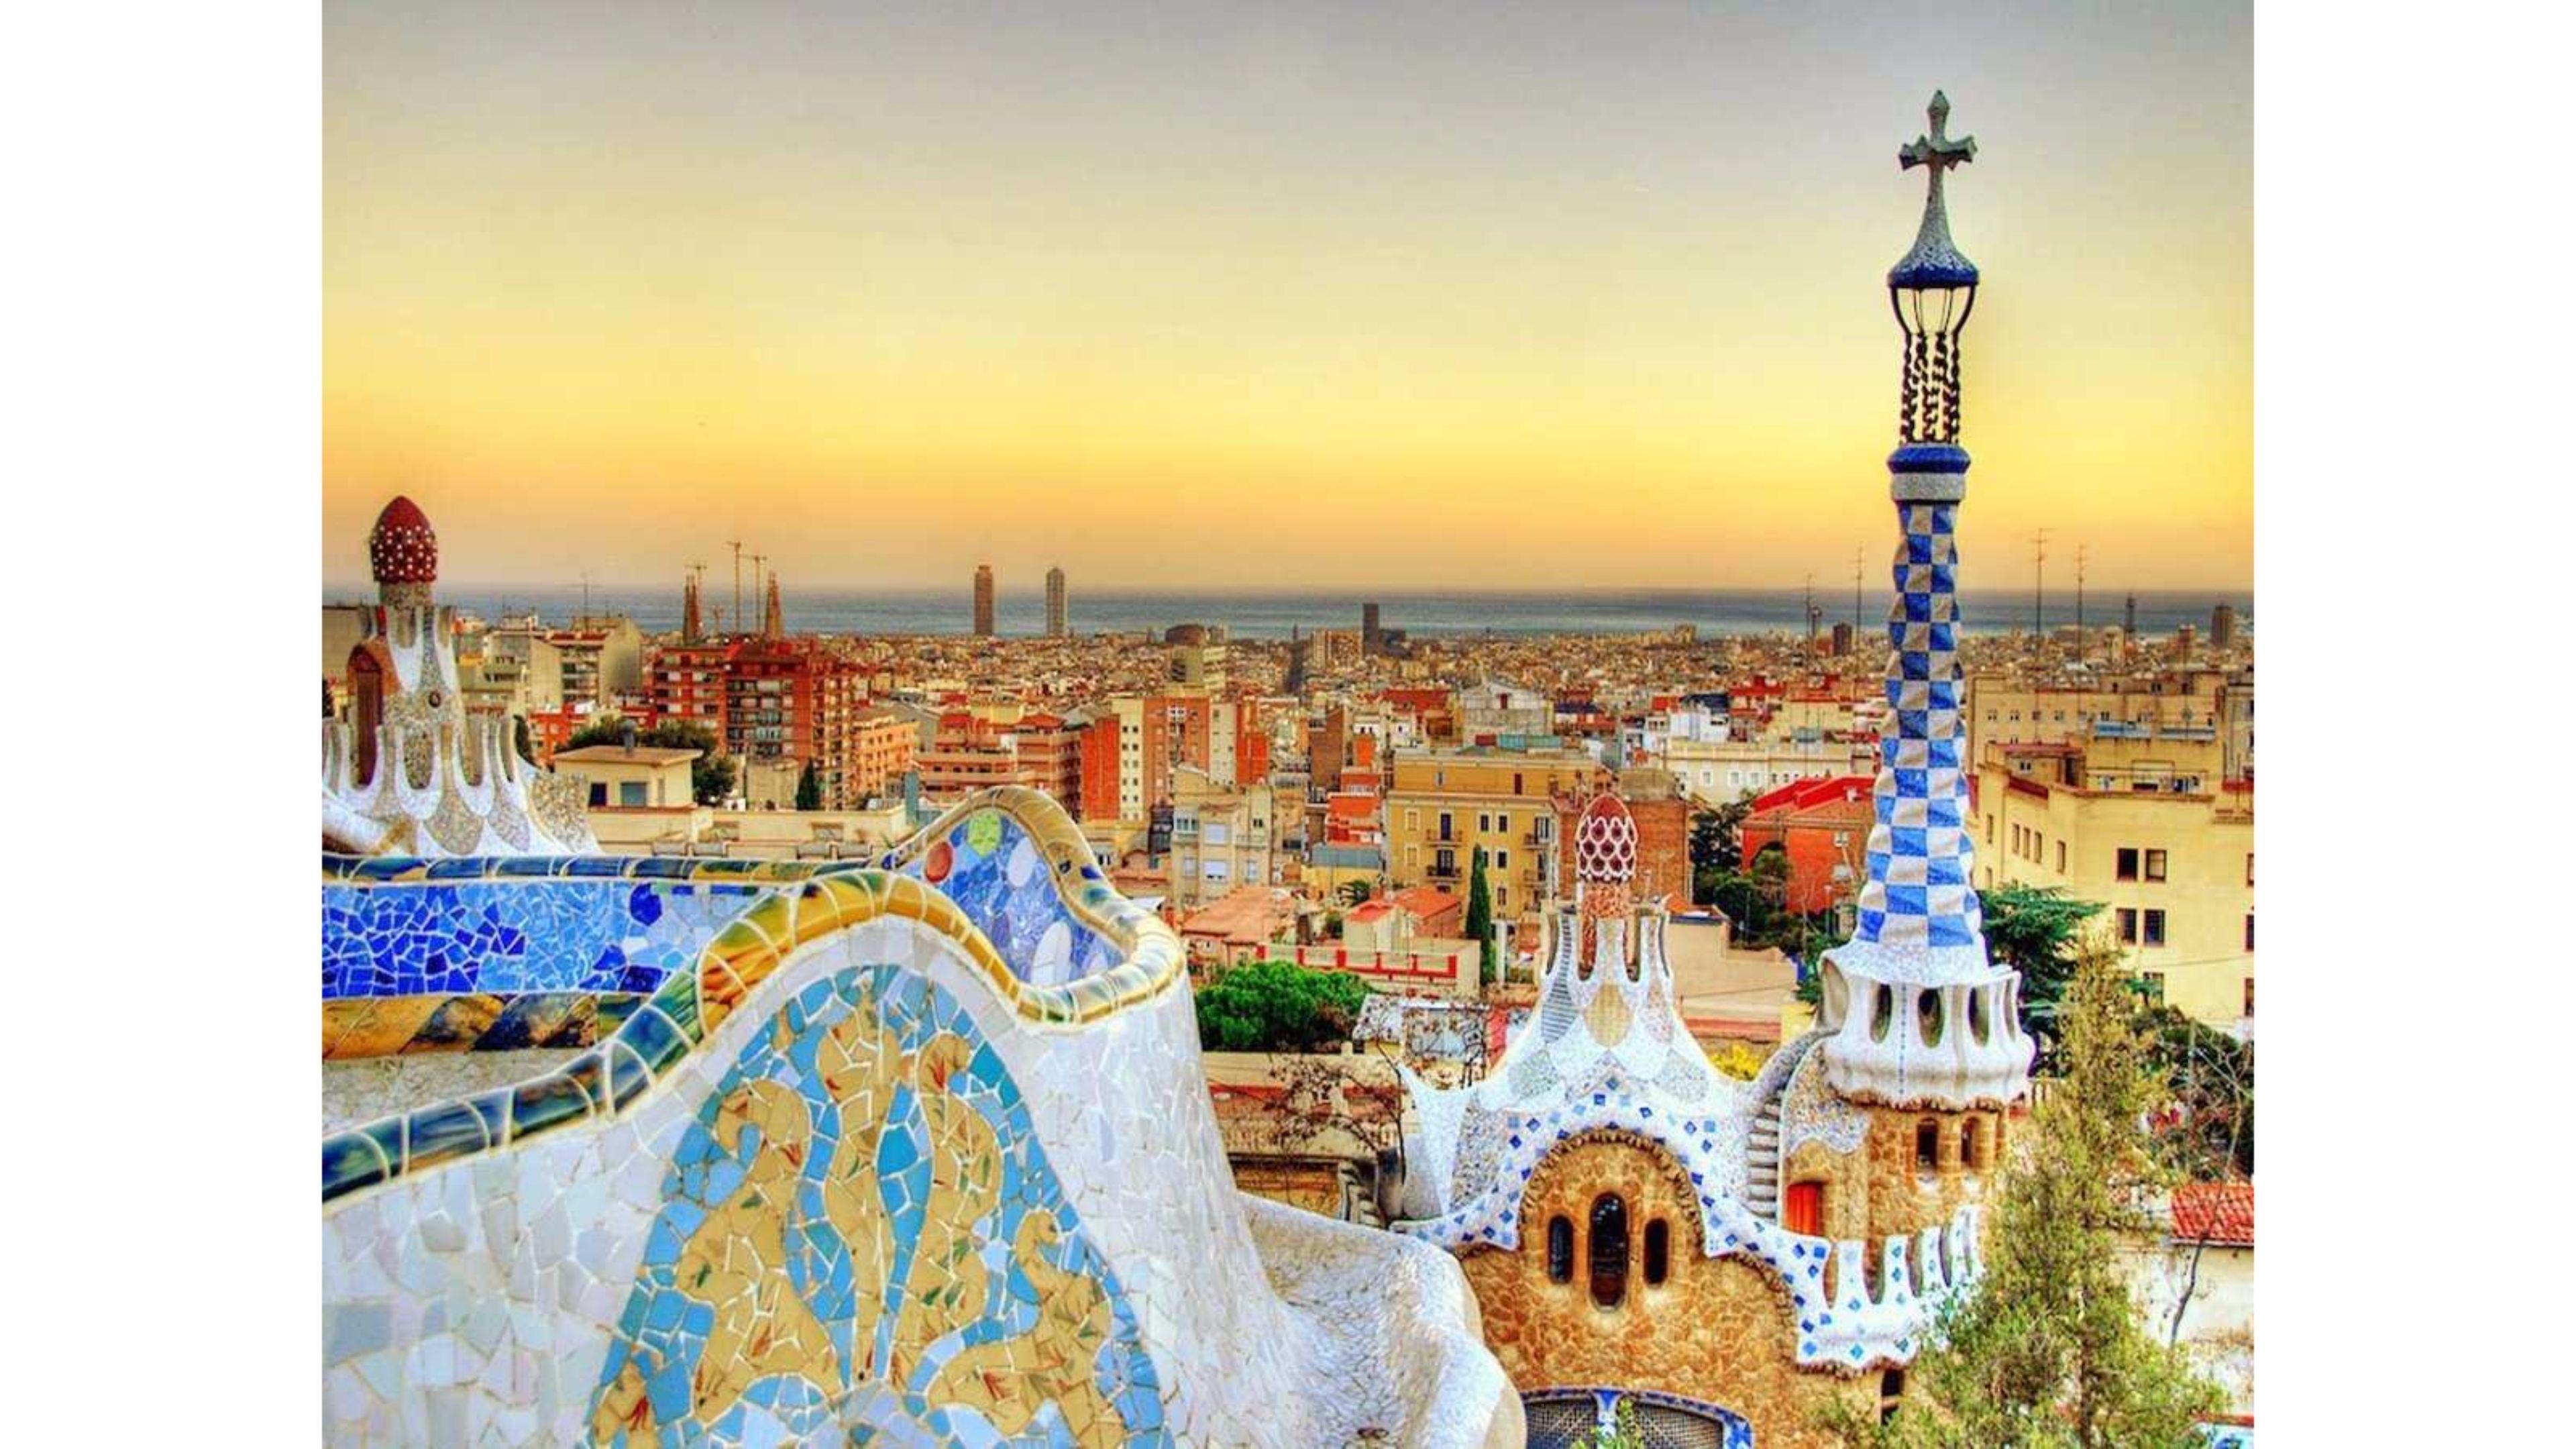 historical barcelona spain 4k - photo #6